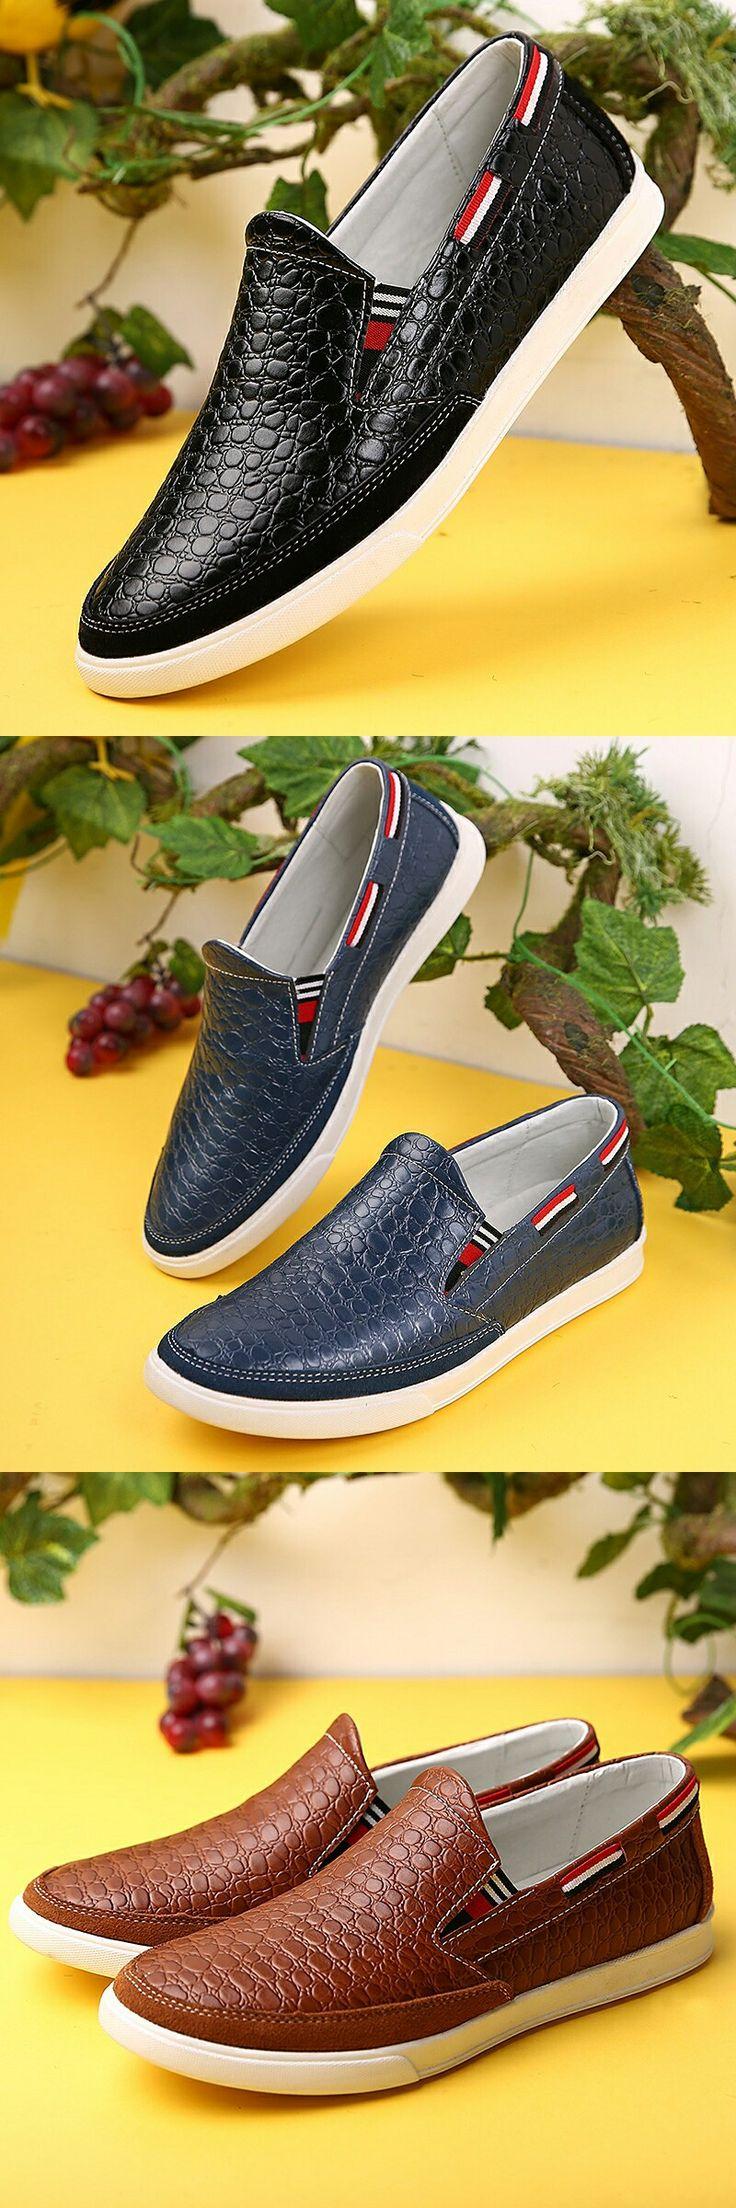 Prelesty Urban Crocodile Men Casual Boat Boat Gentleman Fashion Party Cool Leather   – Dapper Mens' Shoes